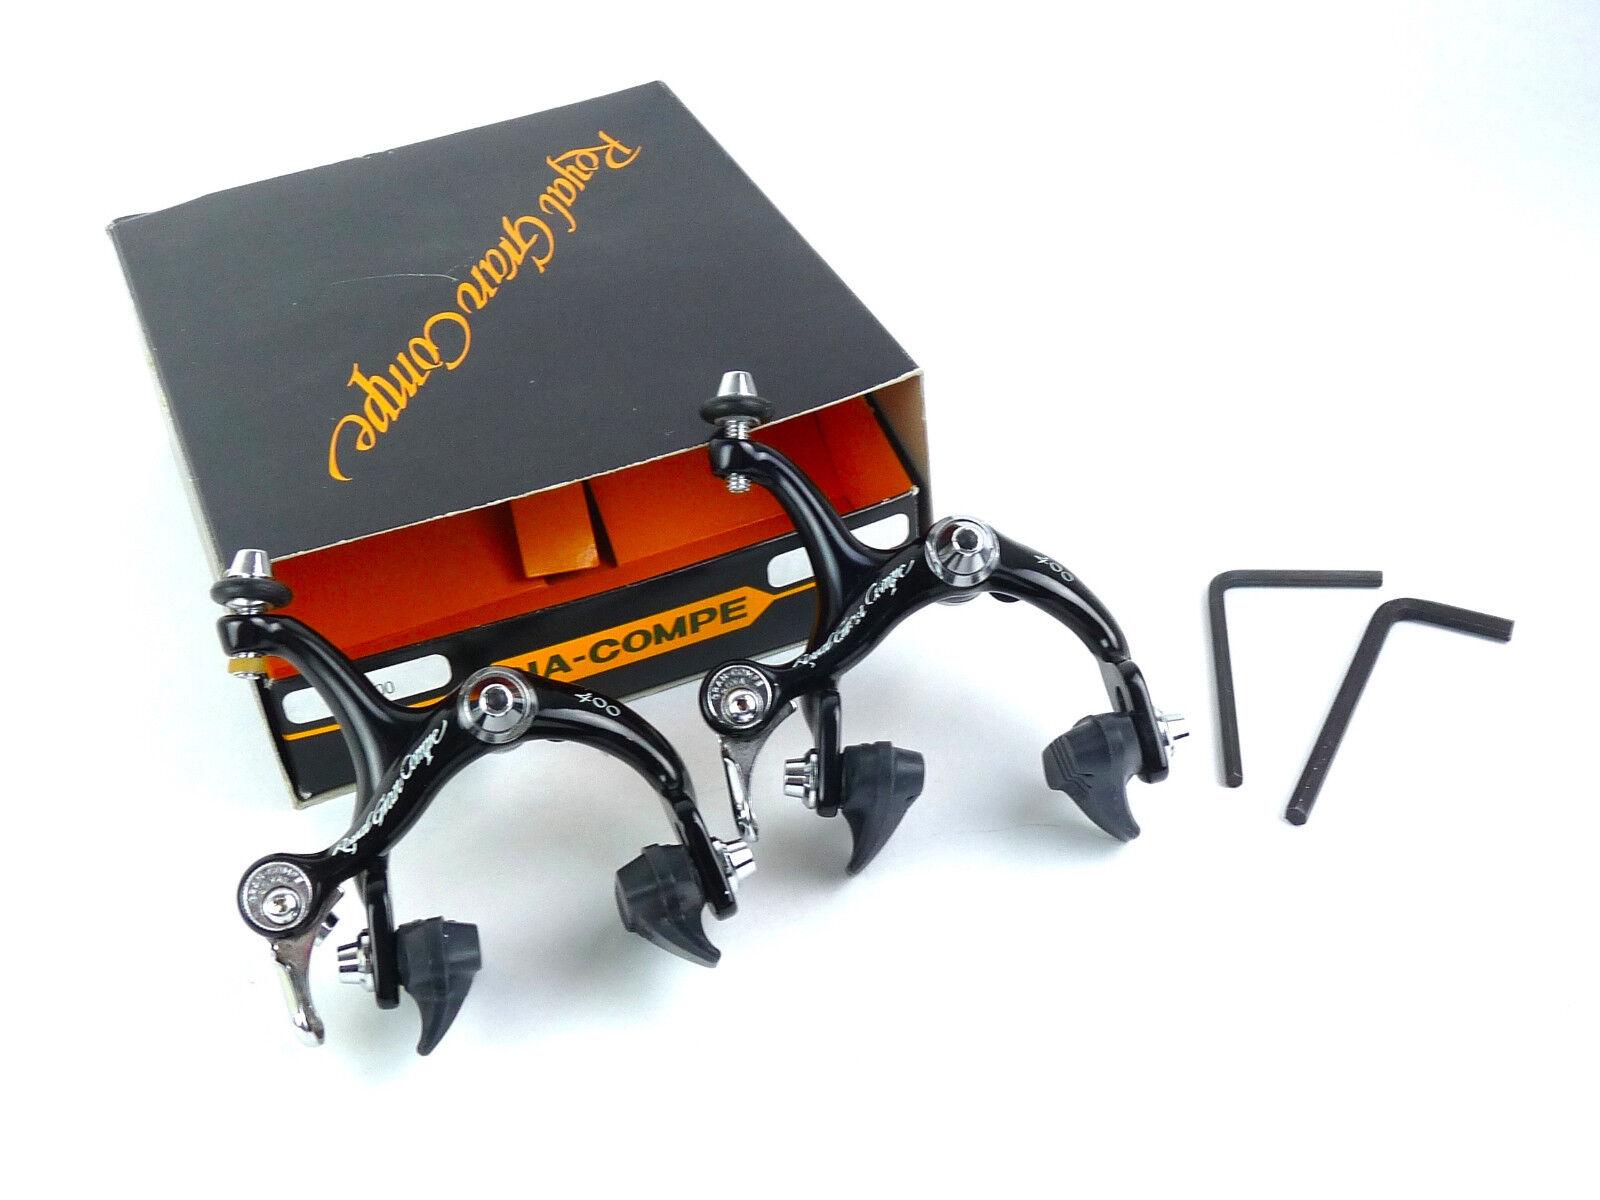 Dia Compe Royal  Gran Compe Brake Caliper Set Vintage for Campagnolo Bike NOS  floor price